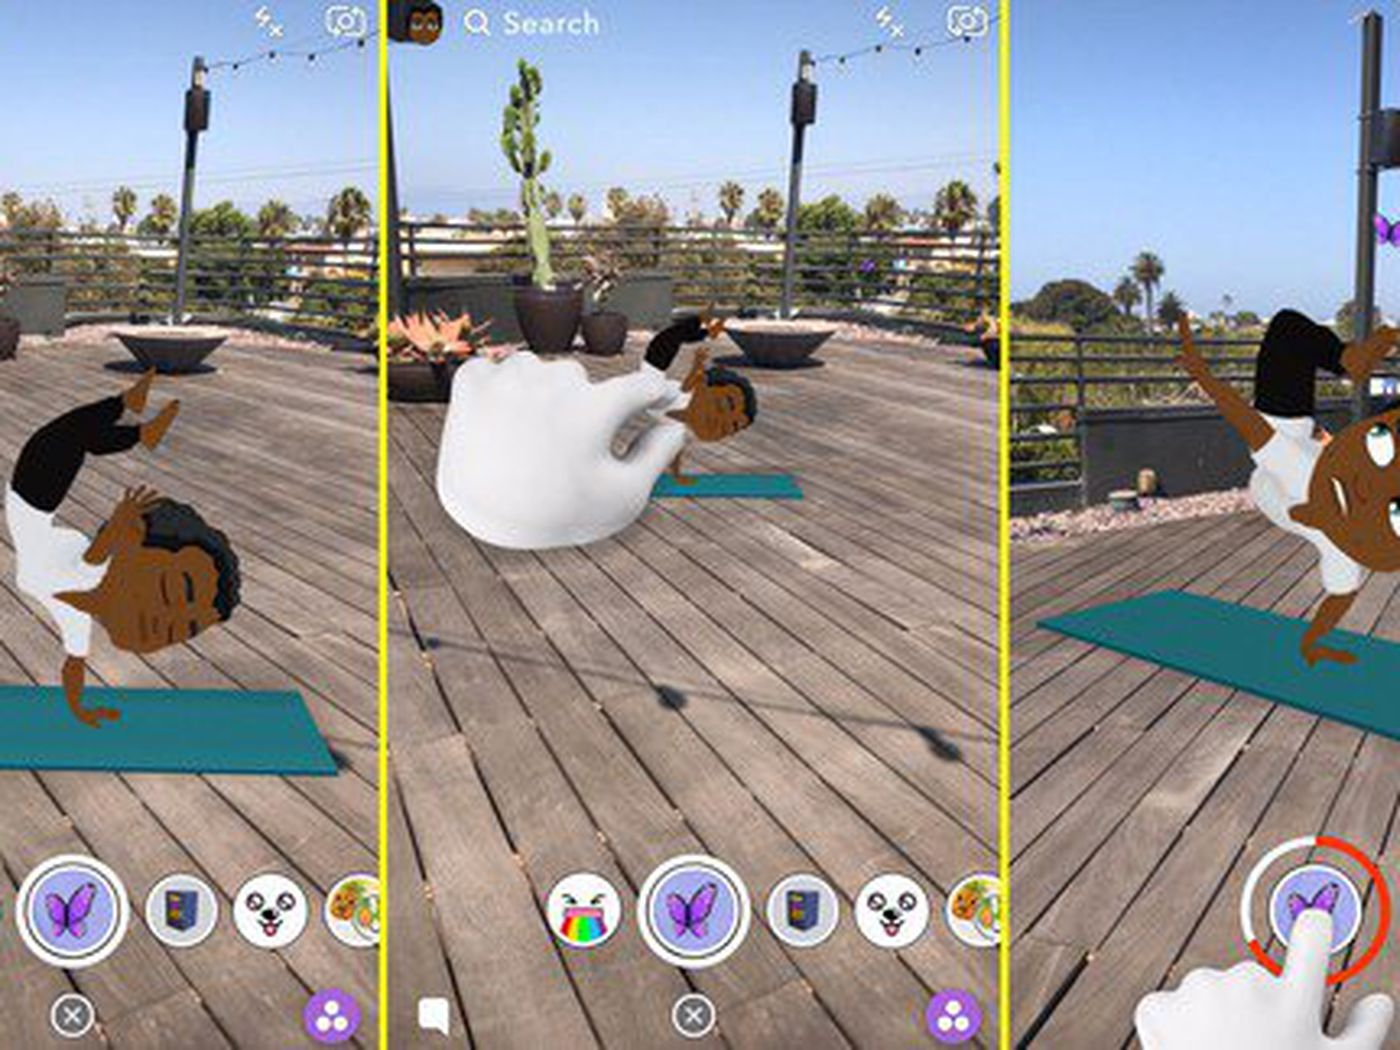 Snapchat's Bitmoji avatars are now three-dimensional and